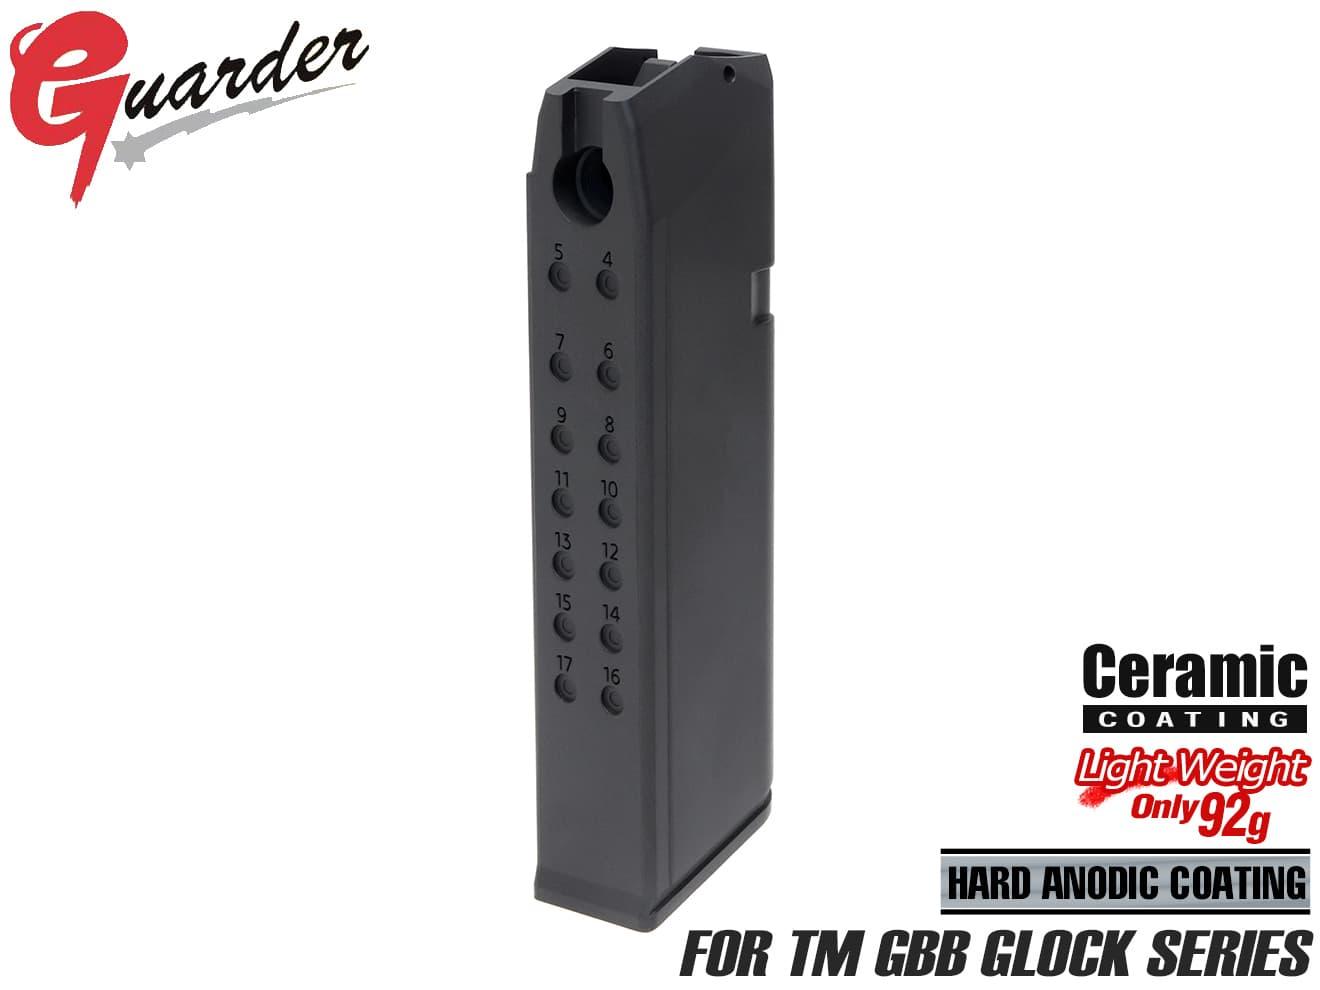 GUARDER ガーダー グロック GLOCK ハウジング ケース カバー ガスガン ガスブローバック G17 G18C G22 G34 WE KJ 弾倉 強化 ライトウェイト 軽量 マガジン  GLK-150(A)BK■GUARDER G17/G18C/G22/G34 アルミマガジンケース 9mm BK◆マルイ ガスブローバック GLOCK対応 純正比約60%の軽量化 取り回し向上 GLOCK-150(A)BK